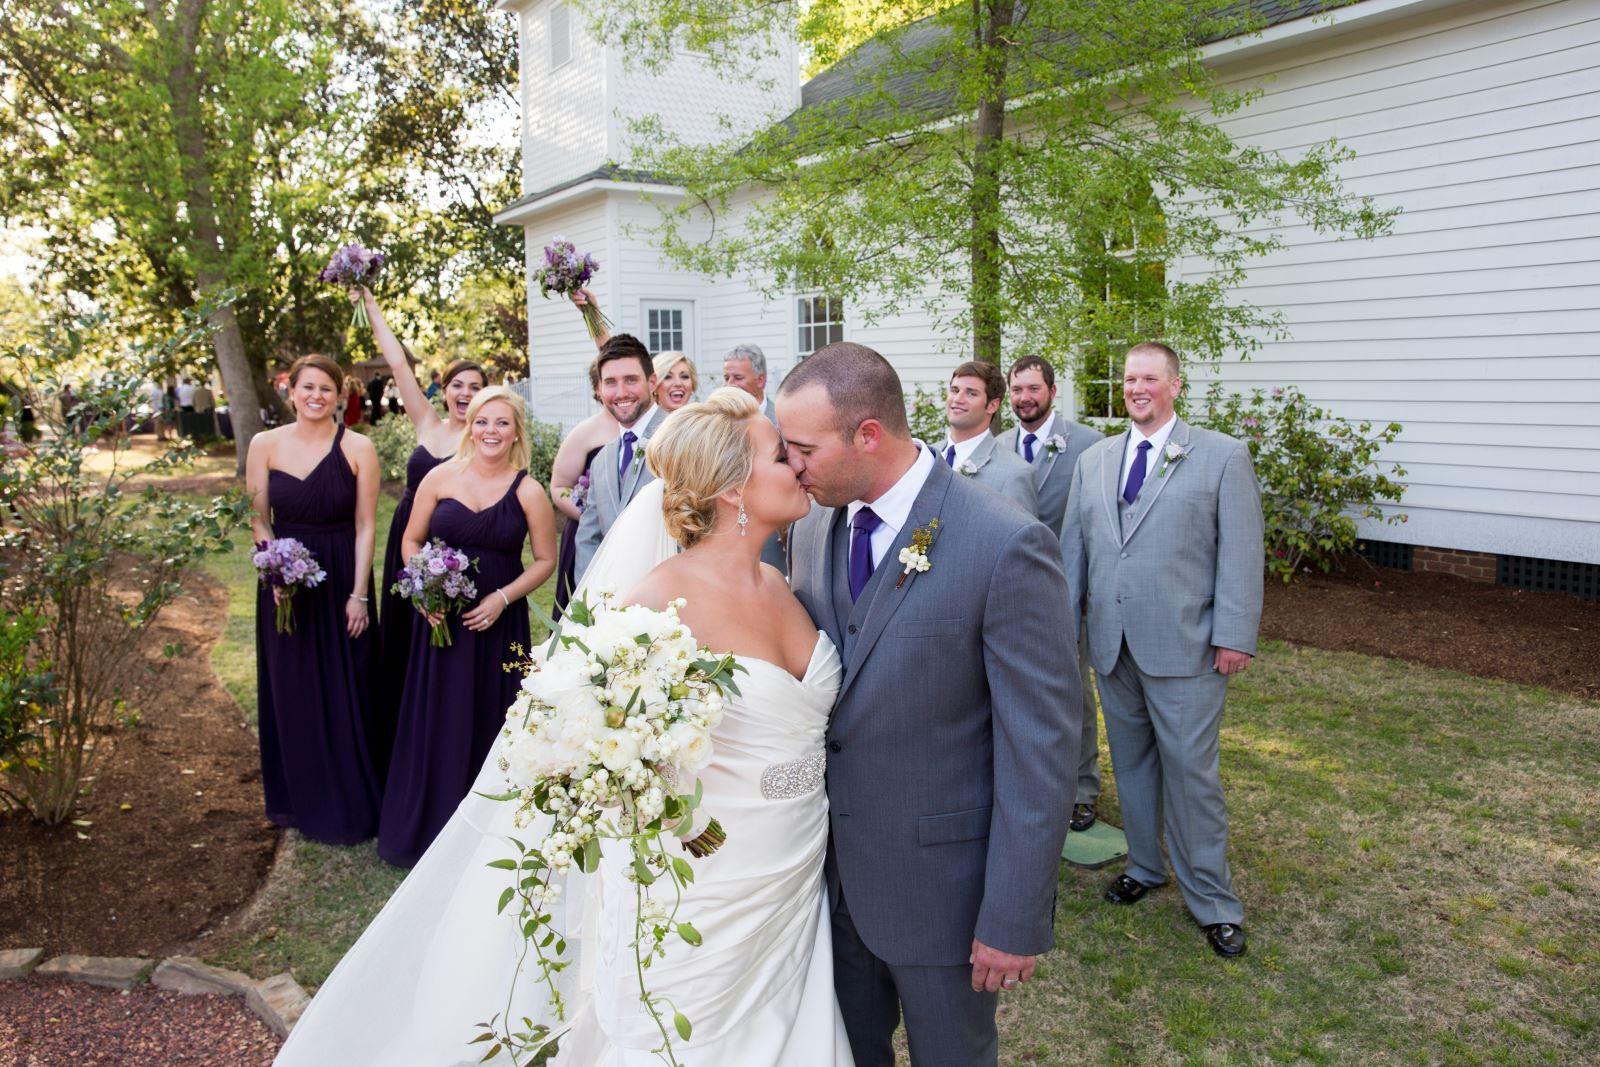 Morgan's Wedding Dress Cleaning in Alabama